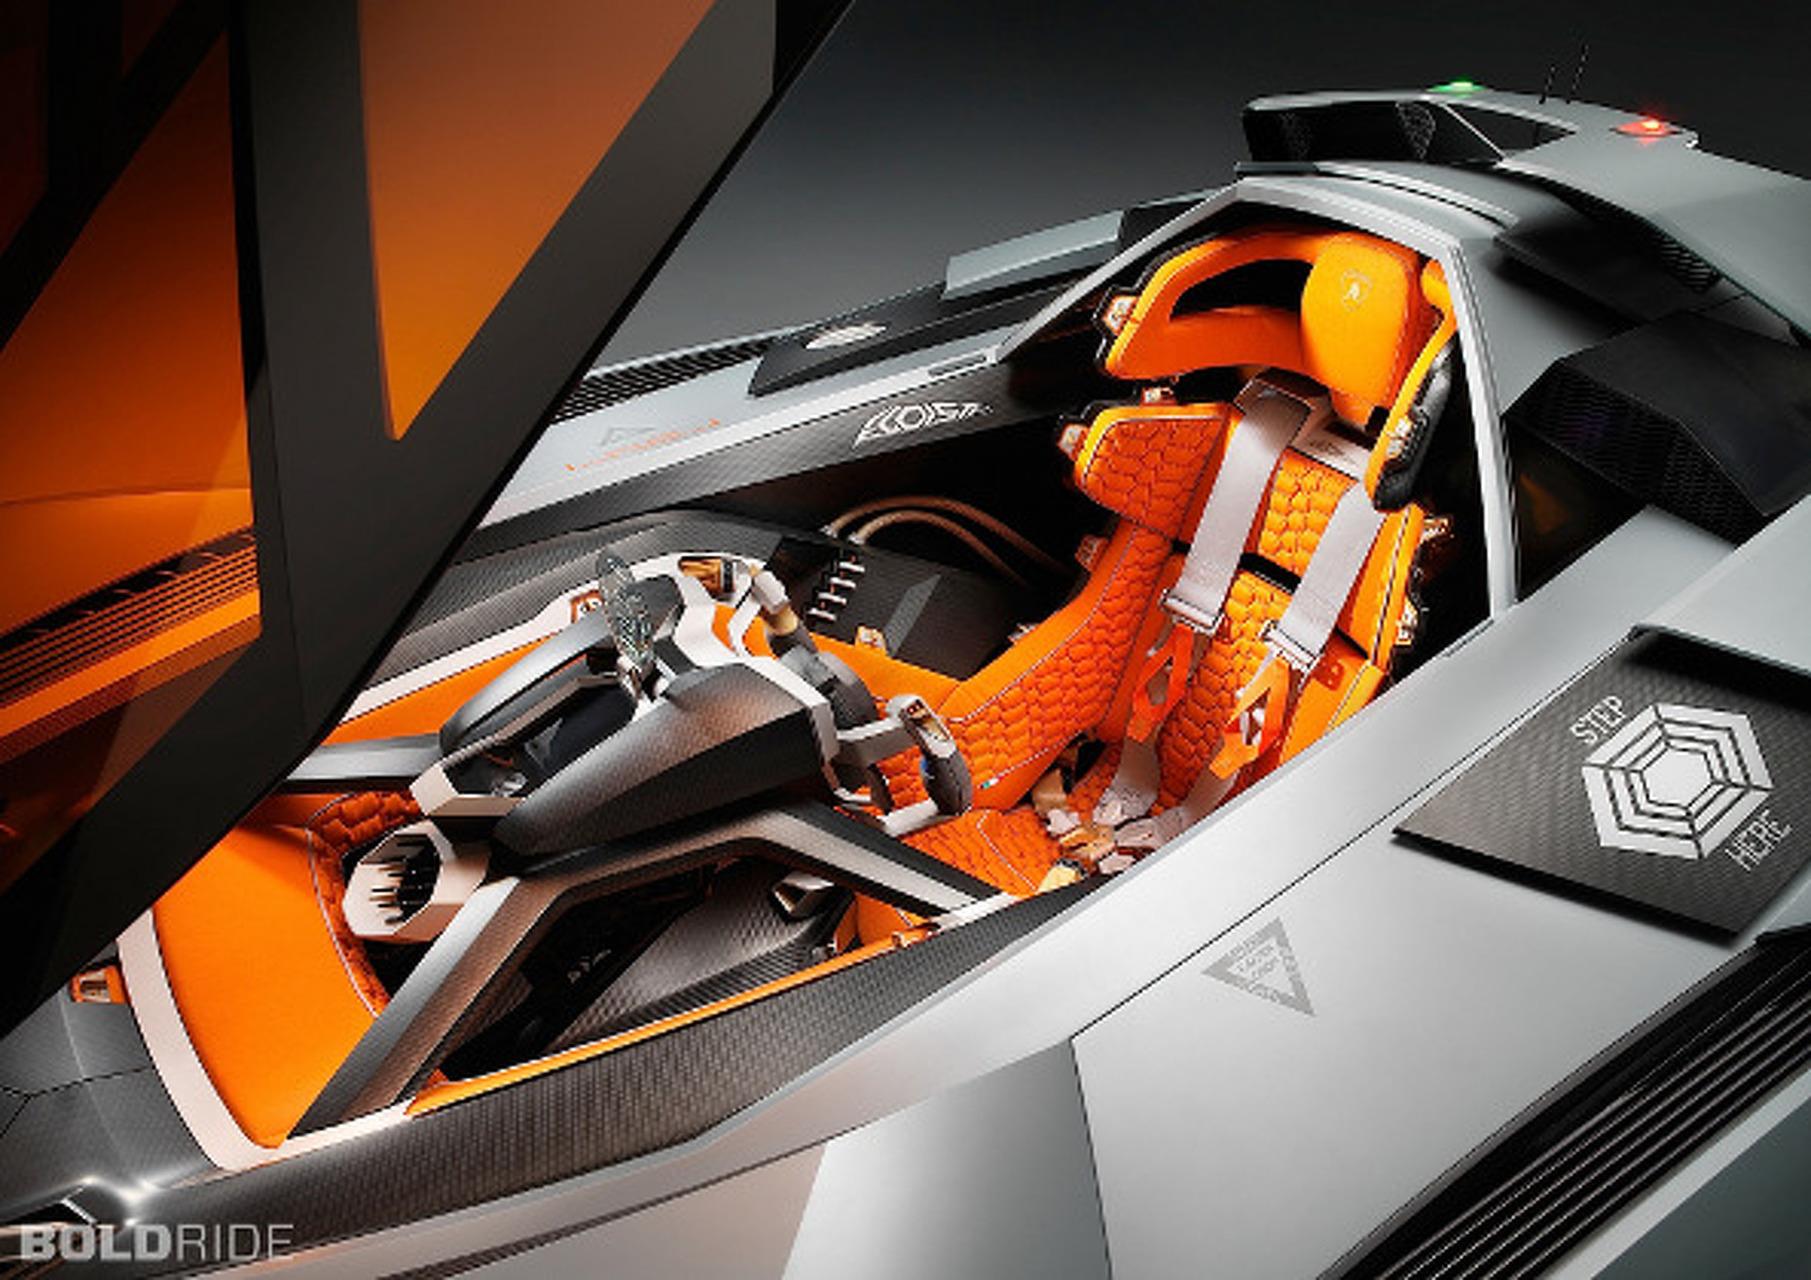 2013 Lamborghini Egoista is the Very Definition of Selfish